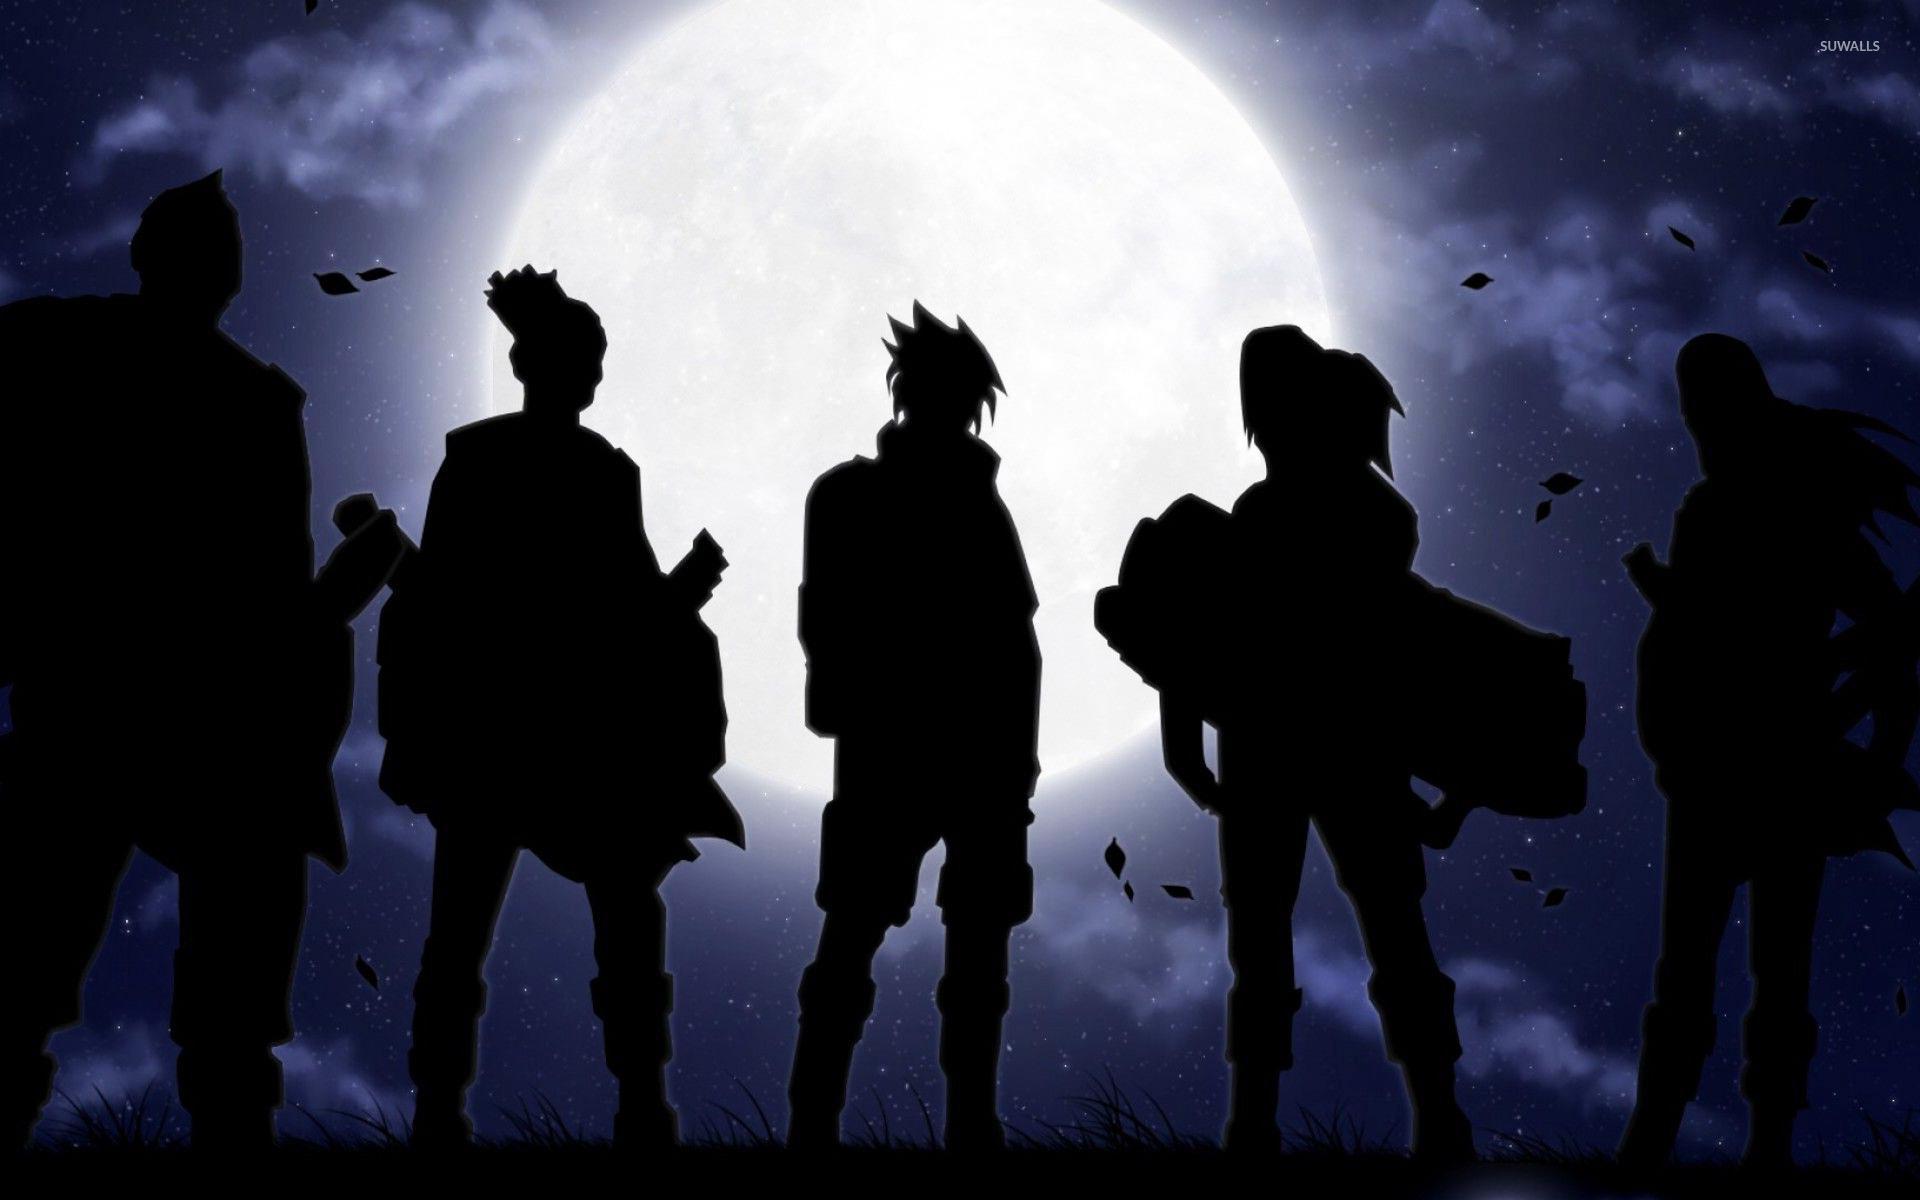 Download Wallpaper Naruto Silhouette - naruto-13708-1920x1200  Photograph.jpg